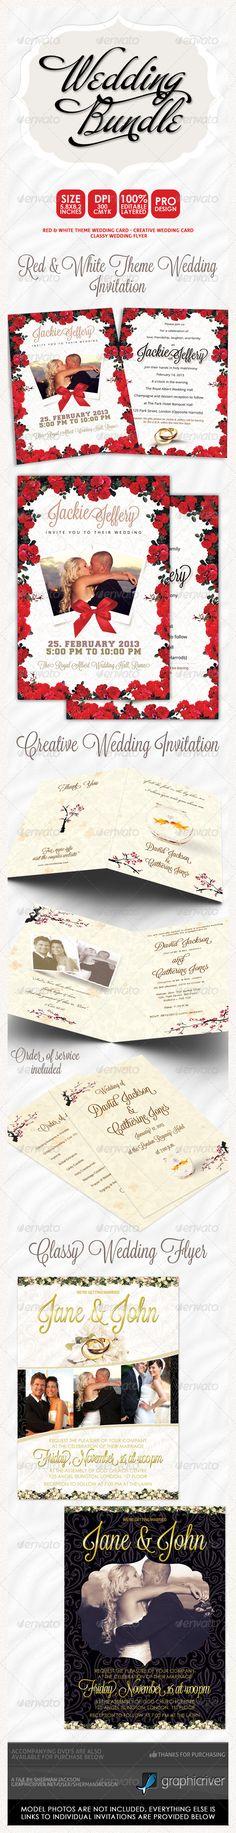 Creative Engagement Wedding Card Wedding card, Invitation card - birthday invitation card template photoshop